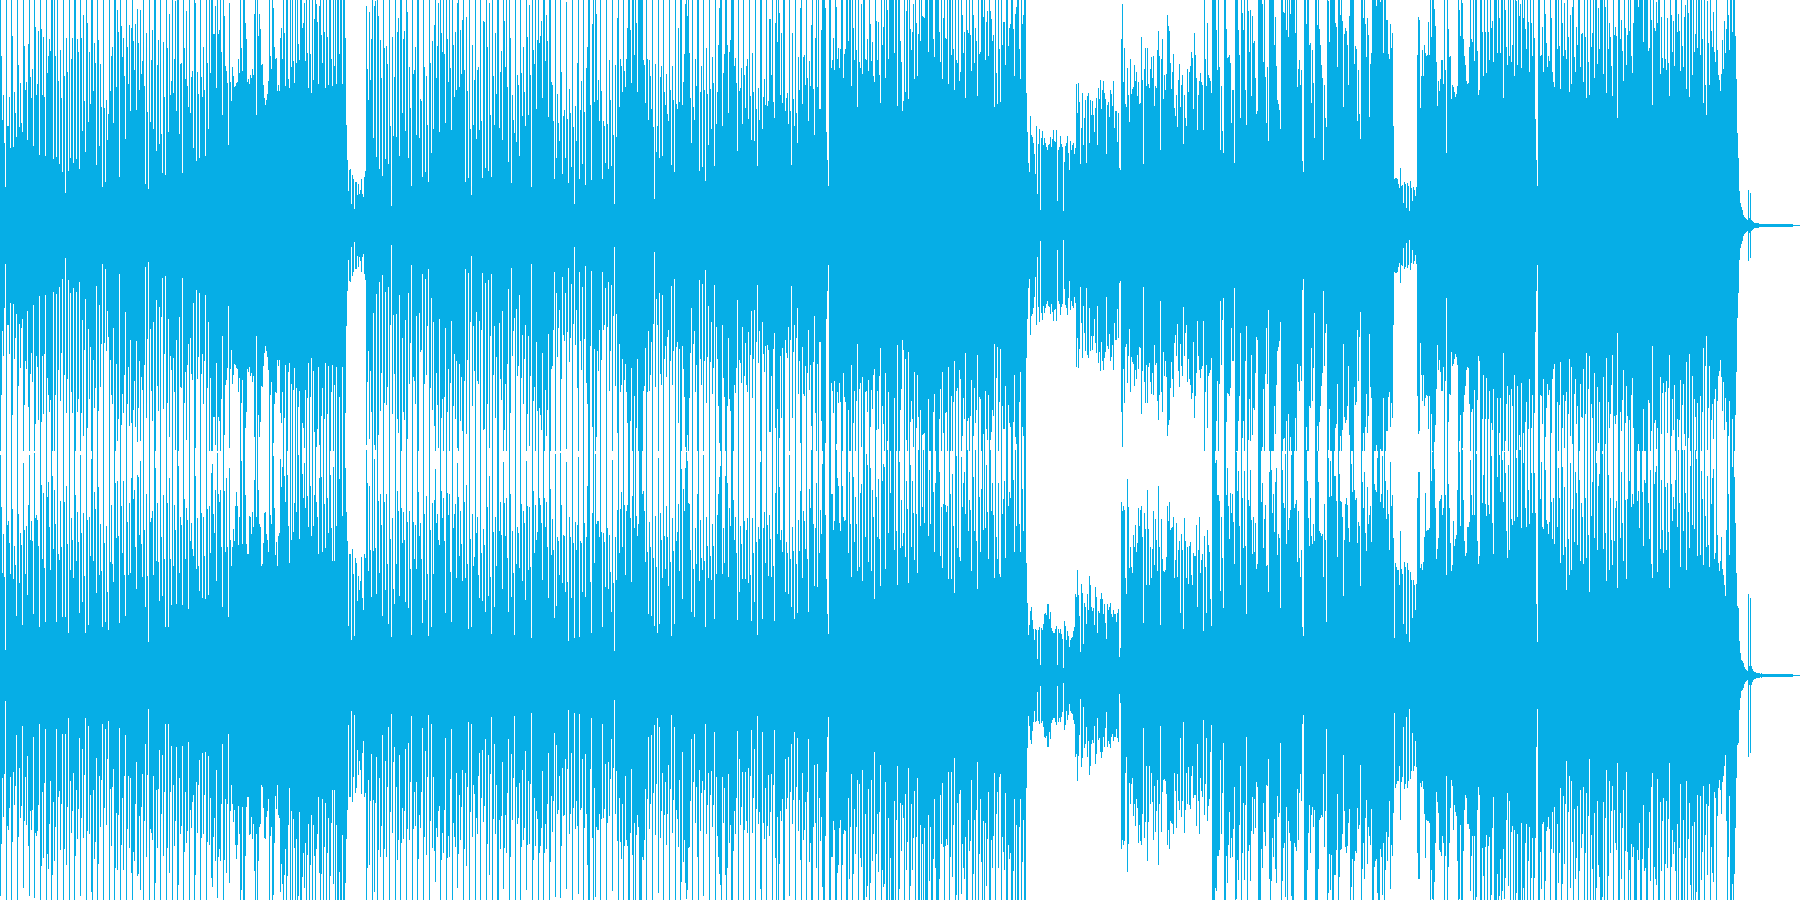 ○oお菓子の国・パステル調ポップo○ Cの再生済みの波形